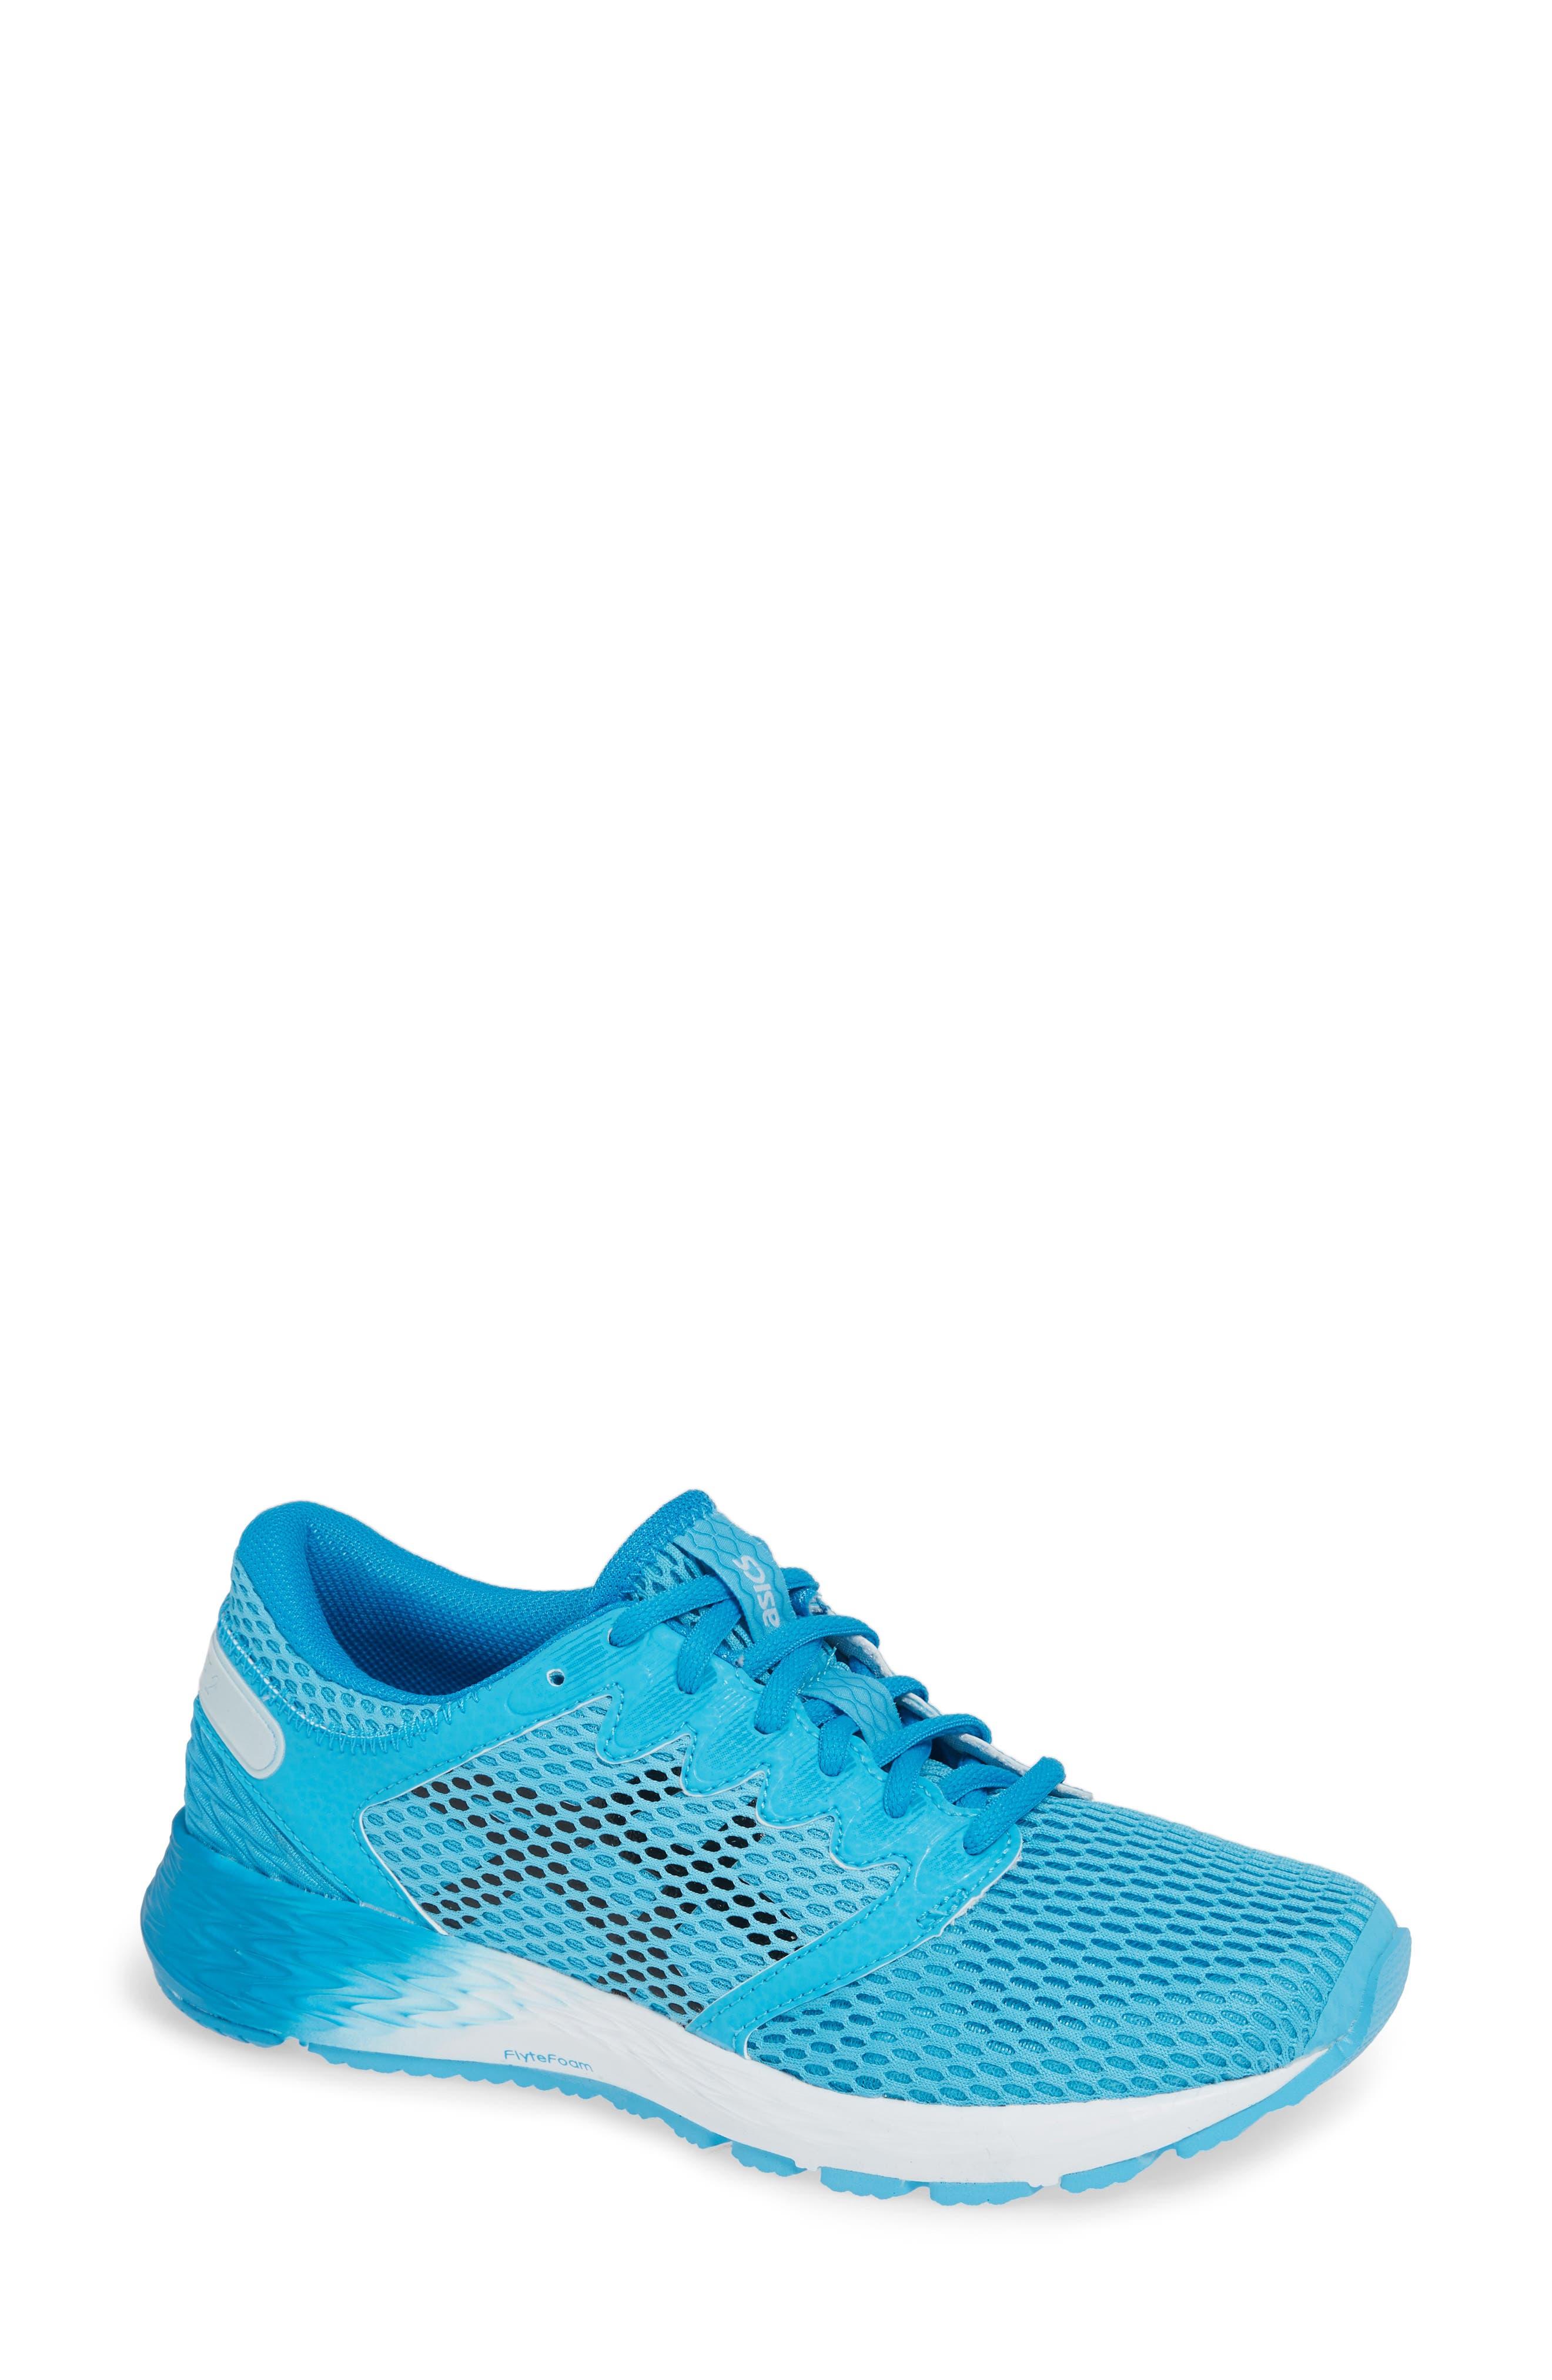 Asics Roadhawk Ff 2 Running Shoe, Blue/green